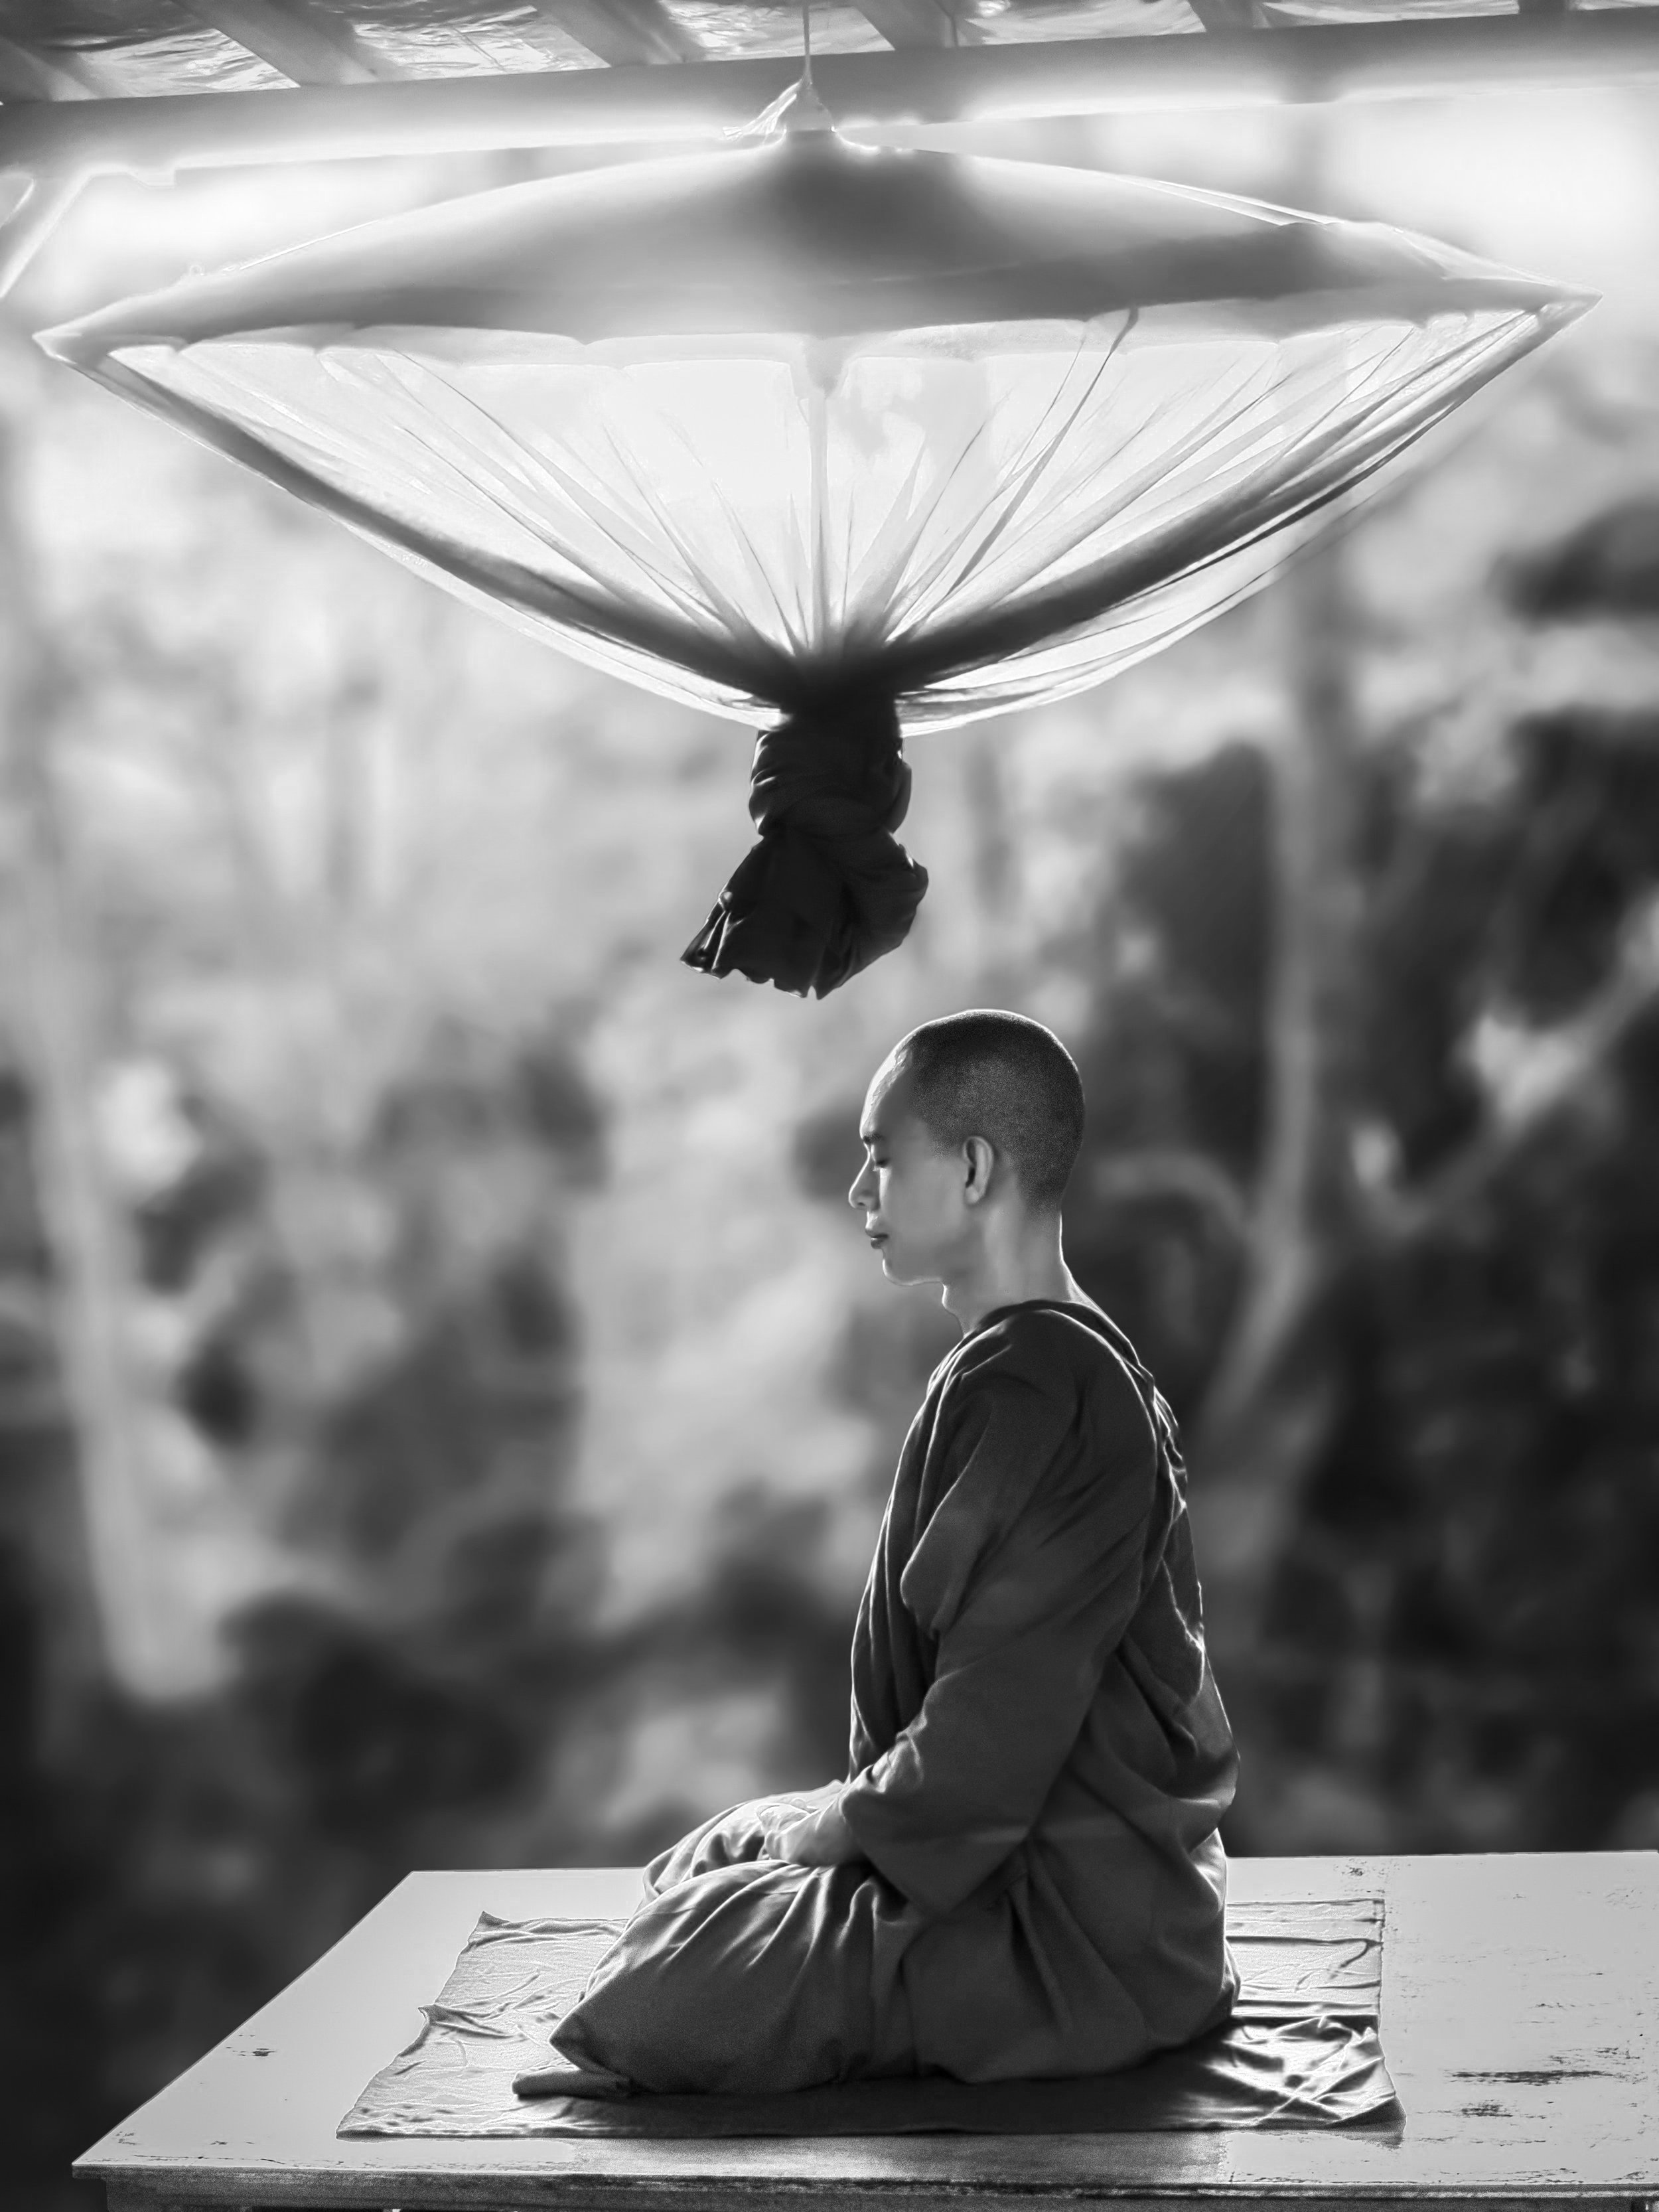 adult-asian-bald-372281.jpg